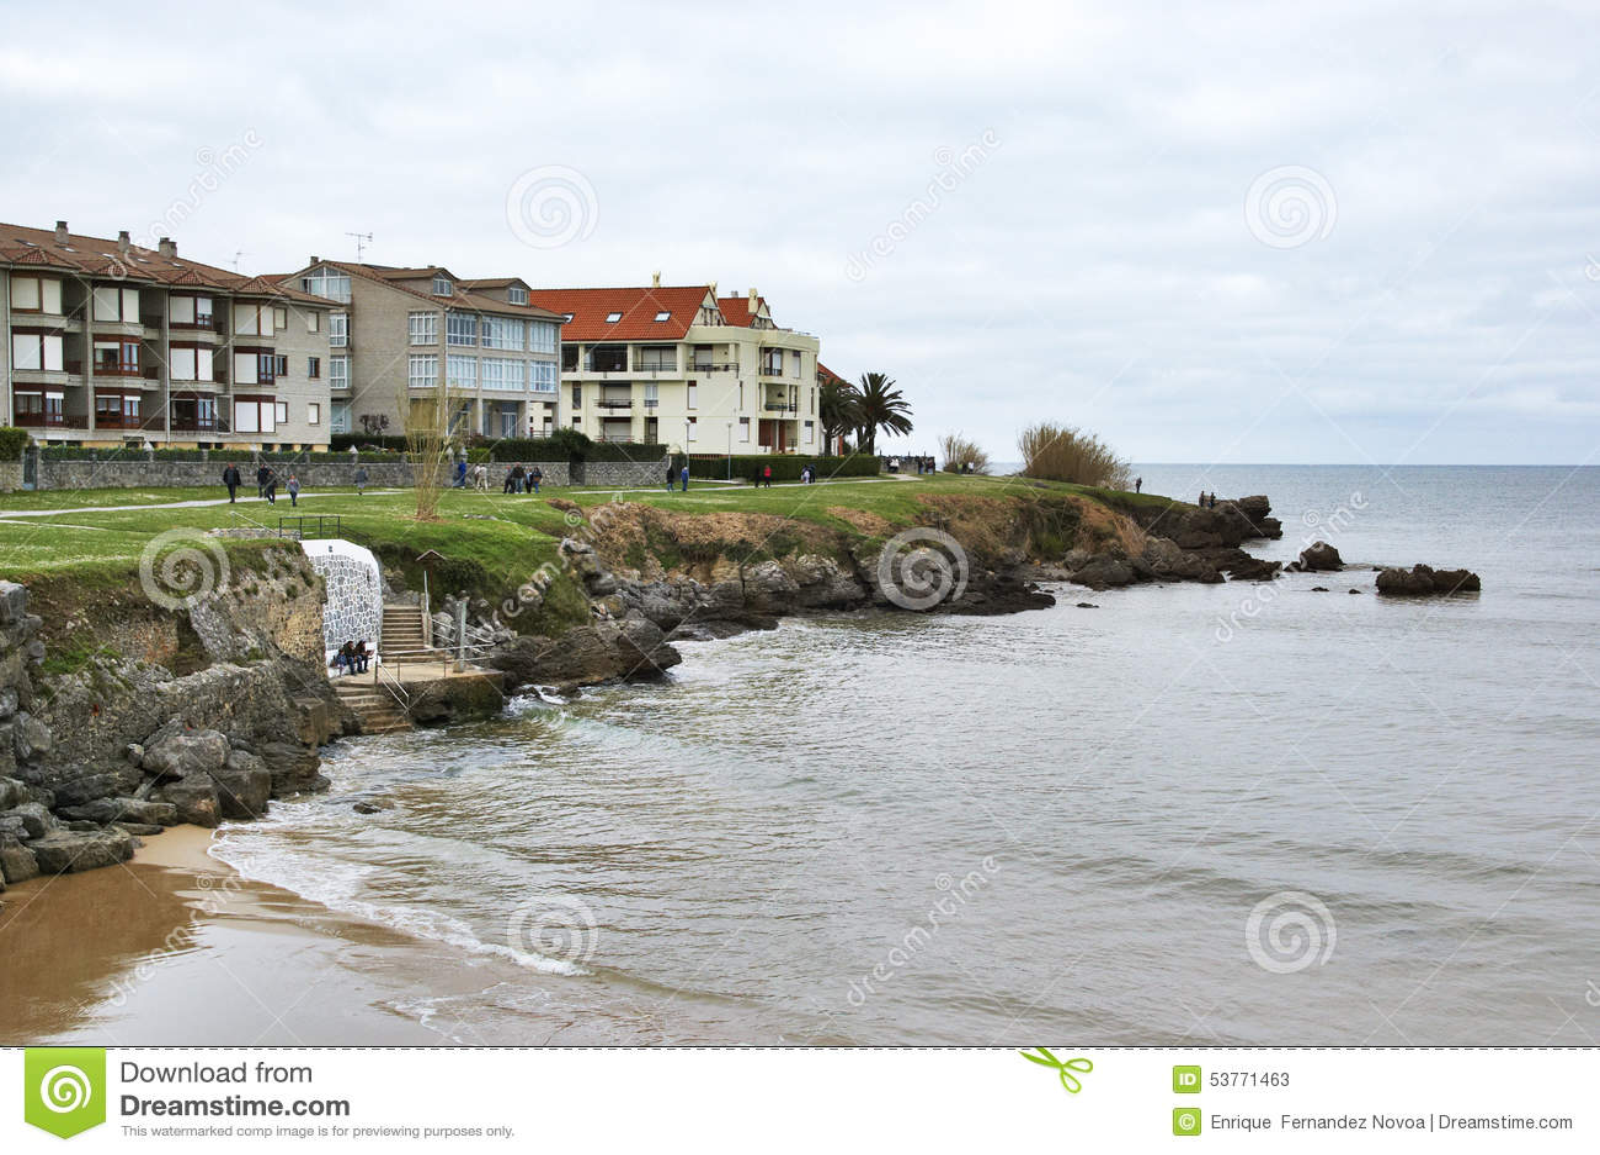 Ajo, Spain - April 3th 2015: Houses in beachfront Noja, Spain